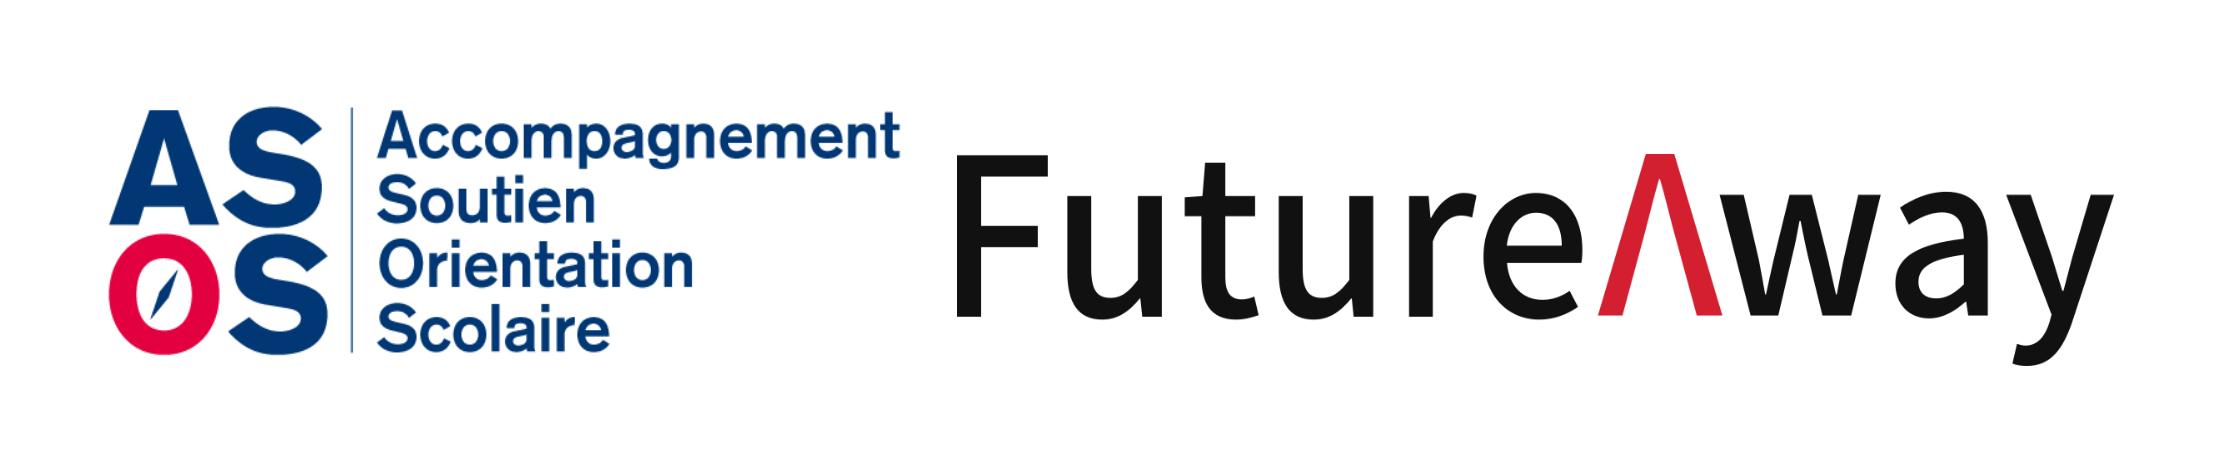 ASOS - FutureAway